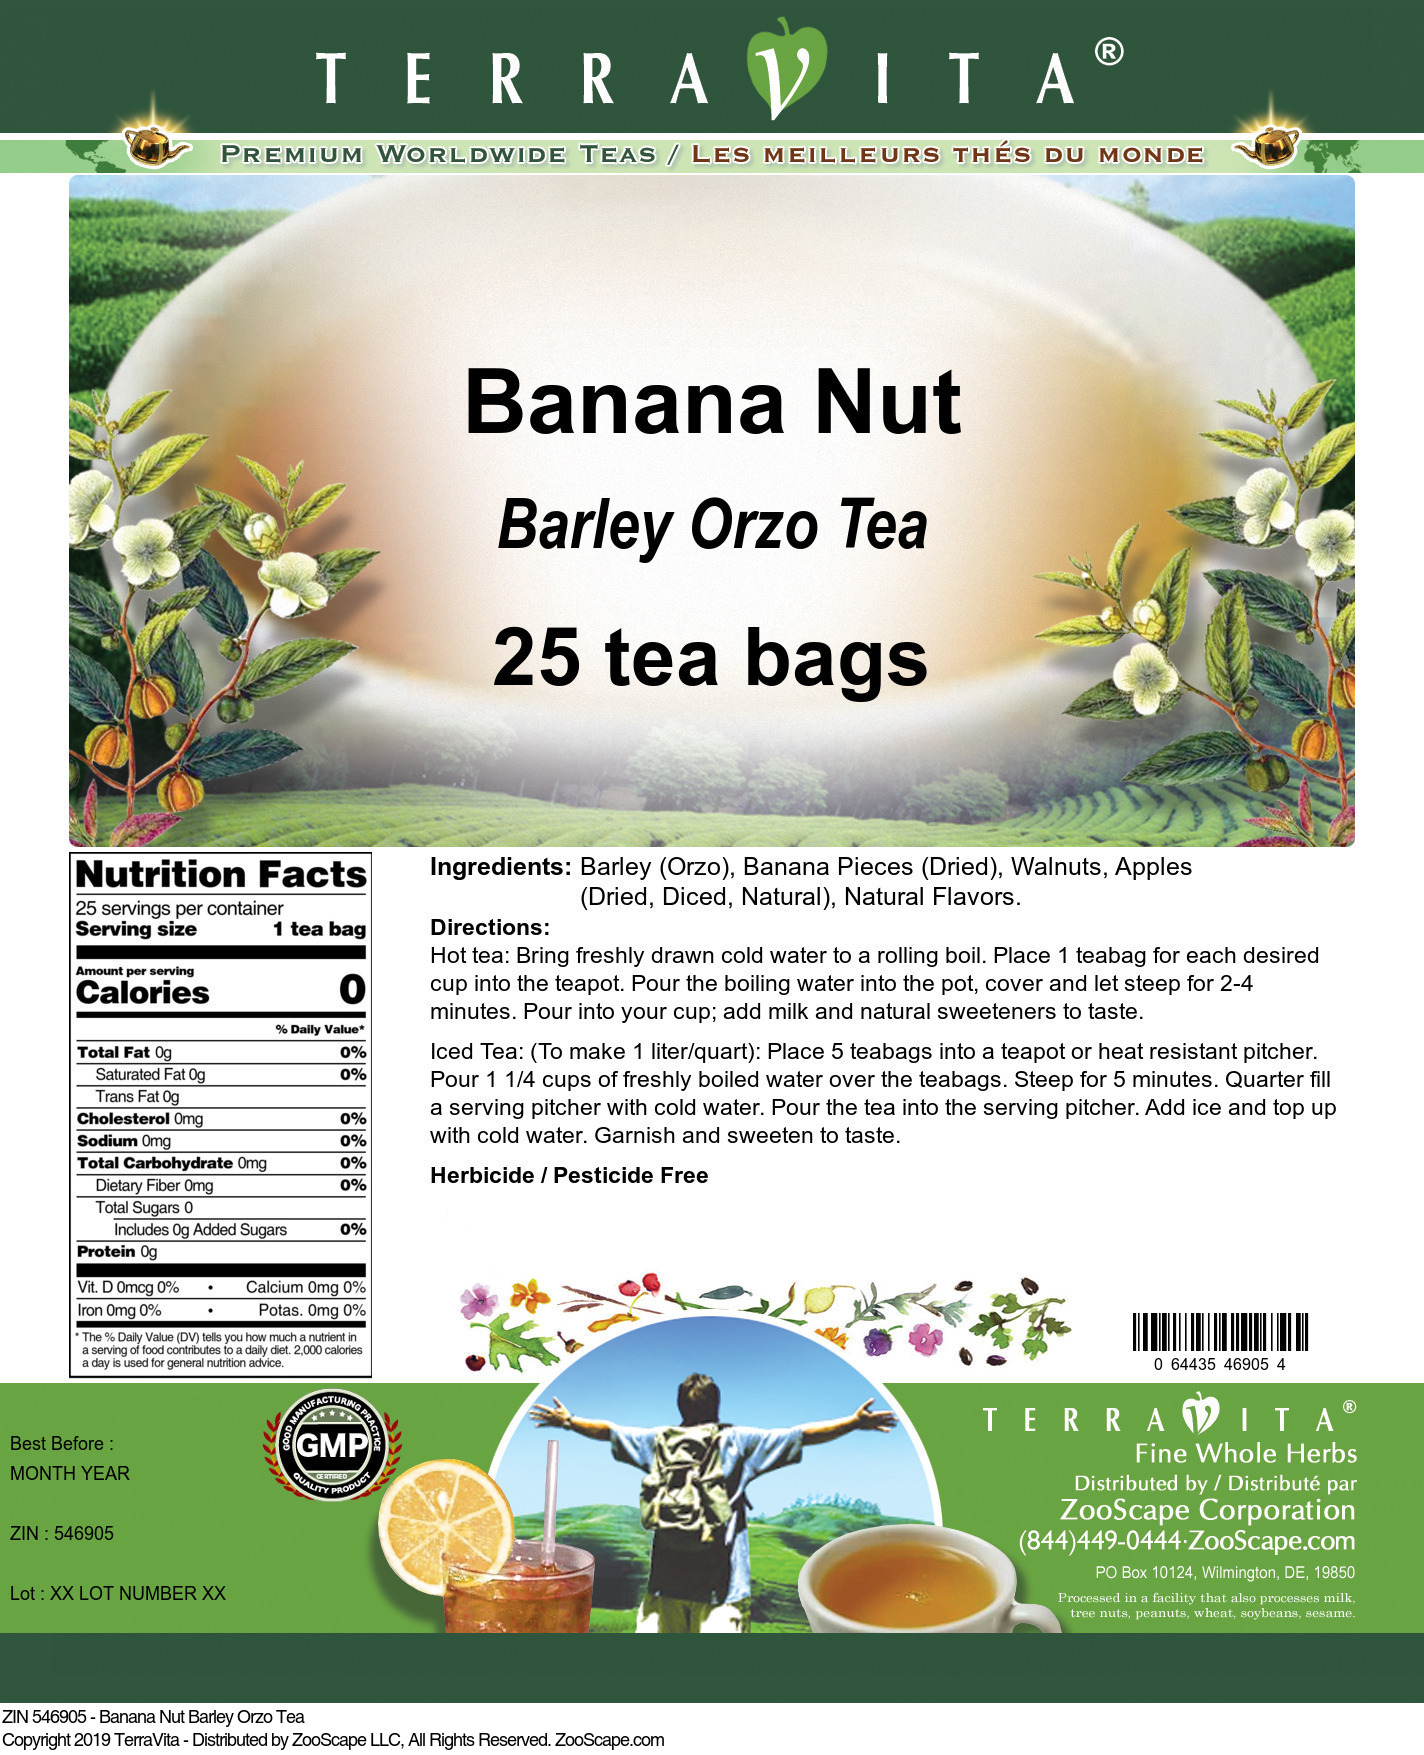 Banana Nut Barley Orzo